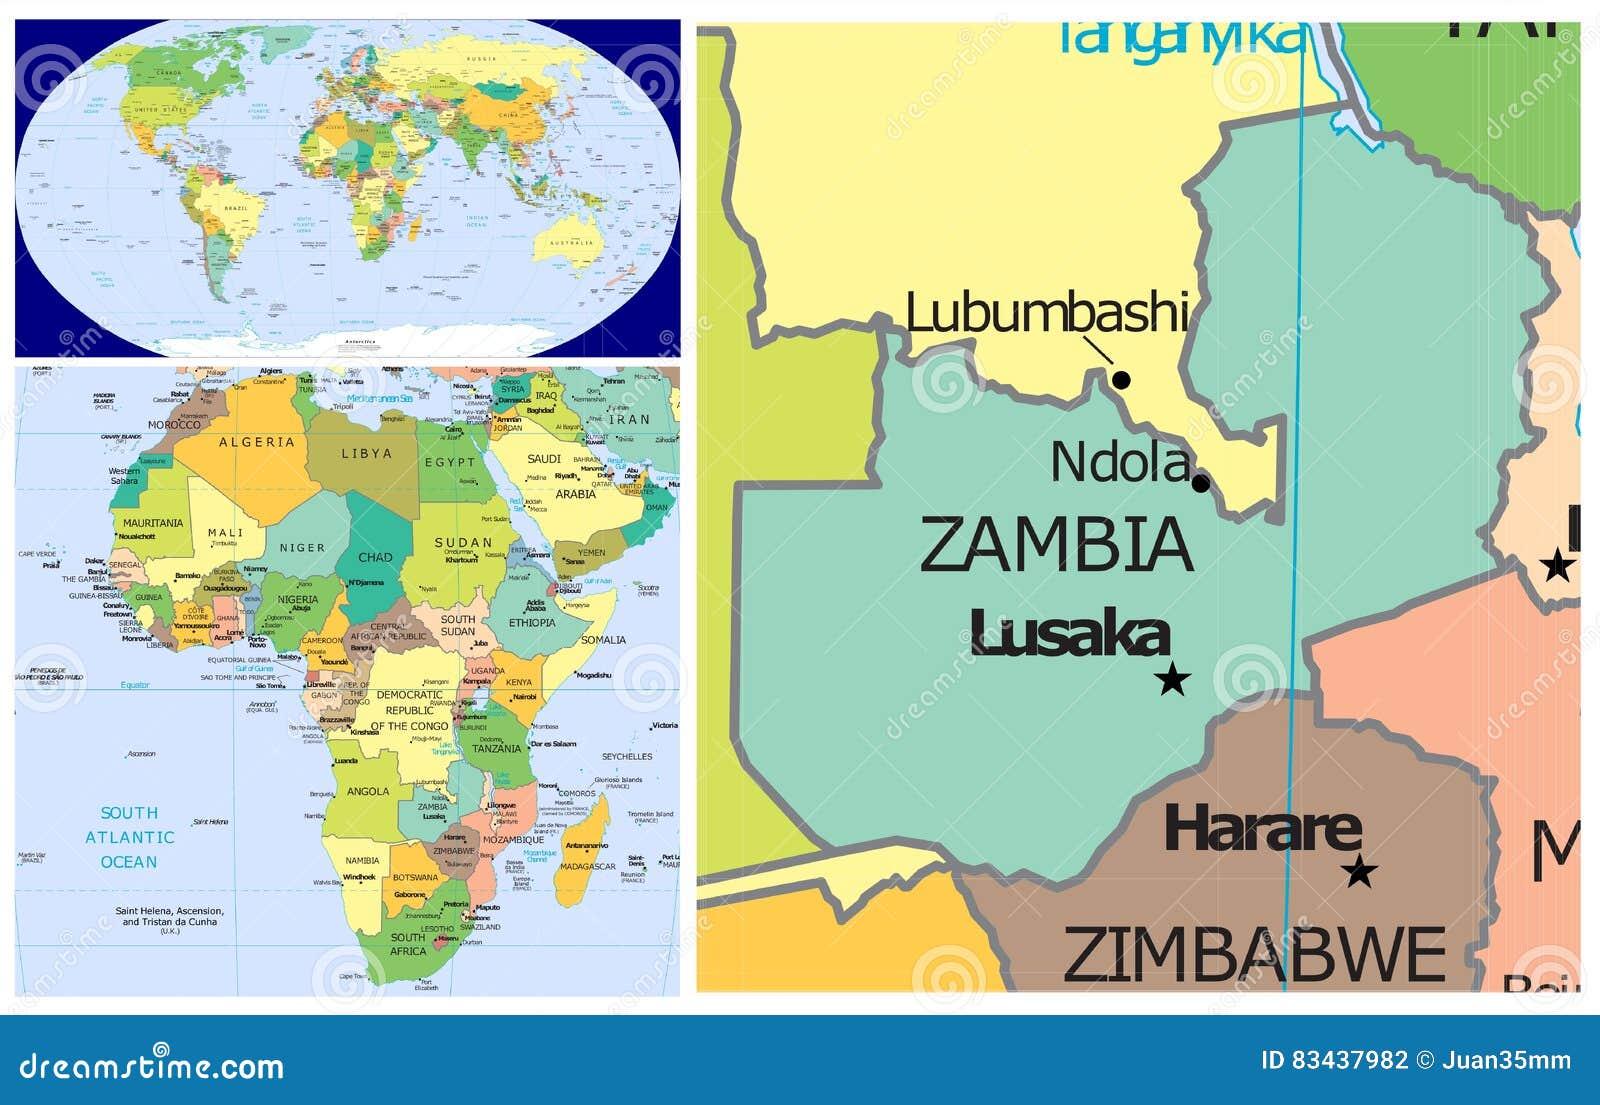 Zambia & World stock illustration. Illustration of antarctic - 83437982